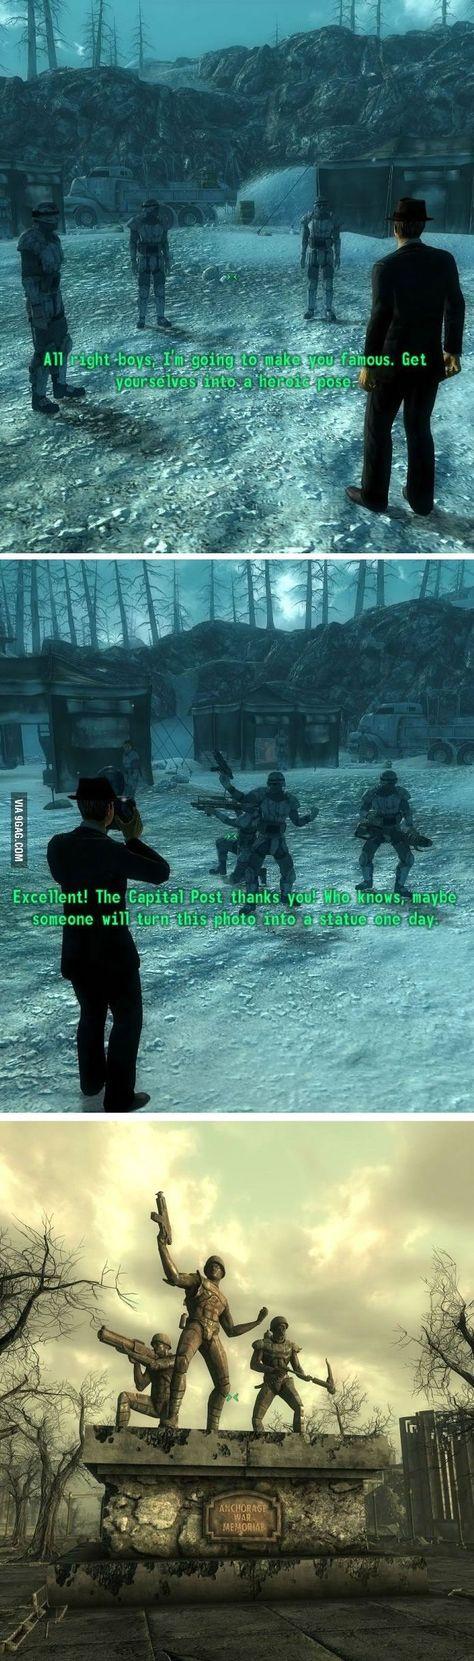 First let me take a selfie Fallout